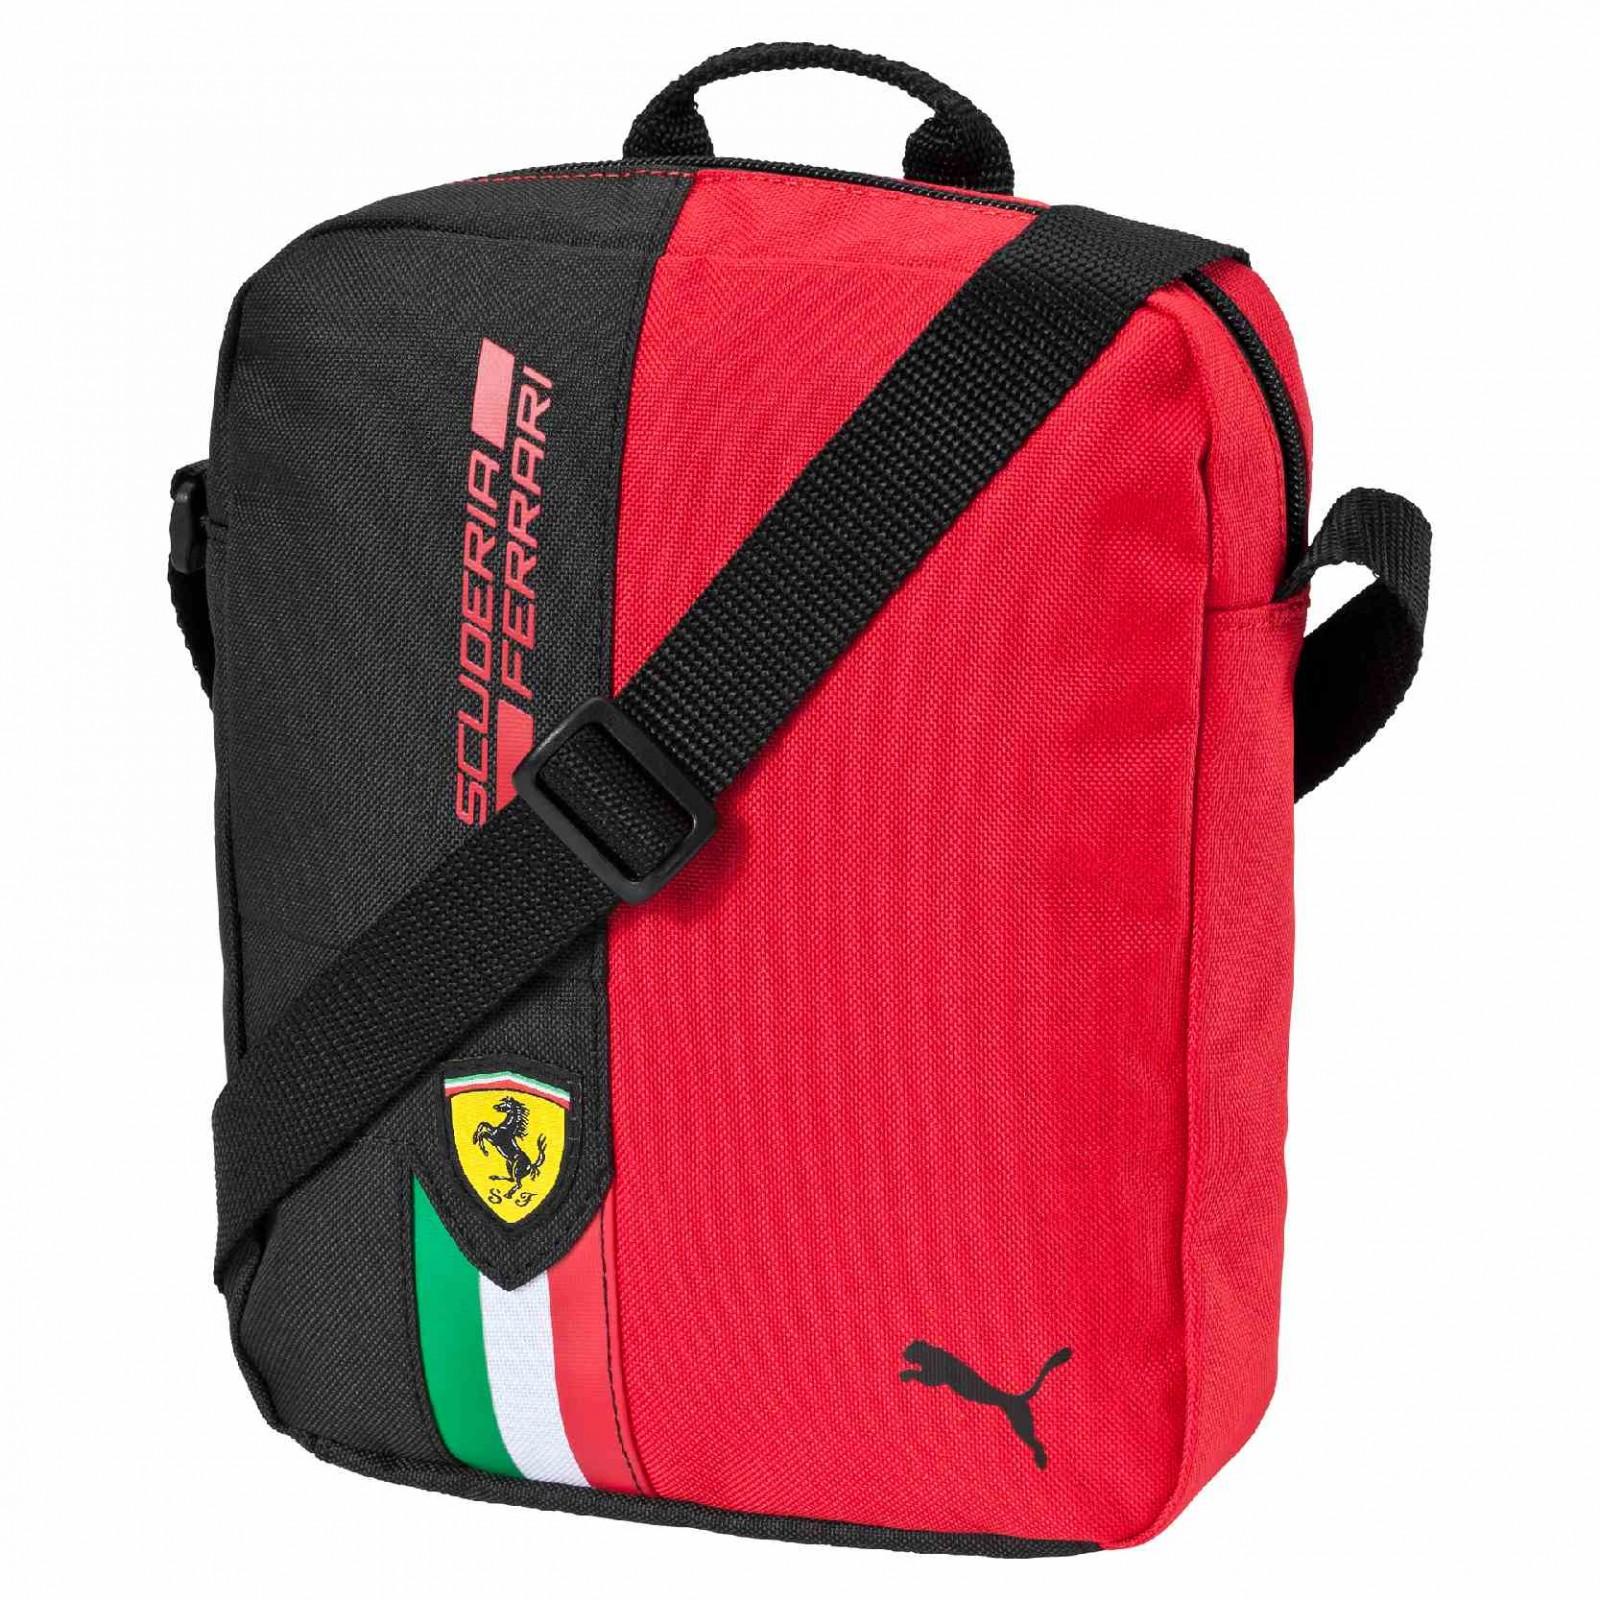 68833c8117 Pánská taška Puma Ferrari Ferrari Fanwear Portable Rosso | D-Sport